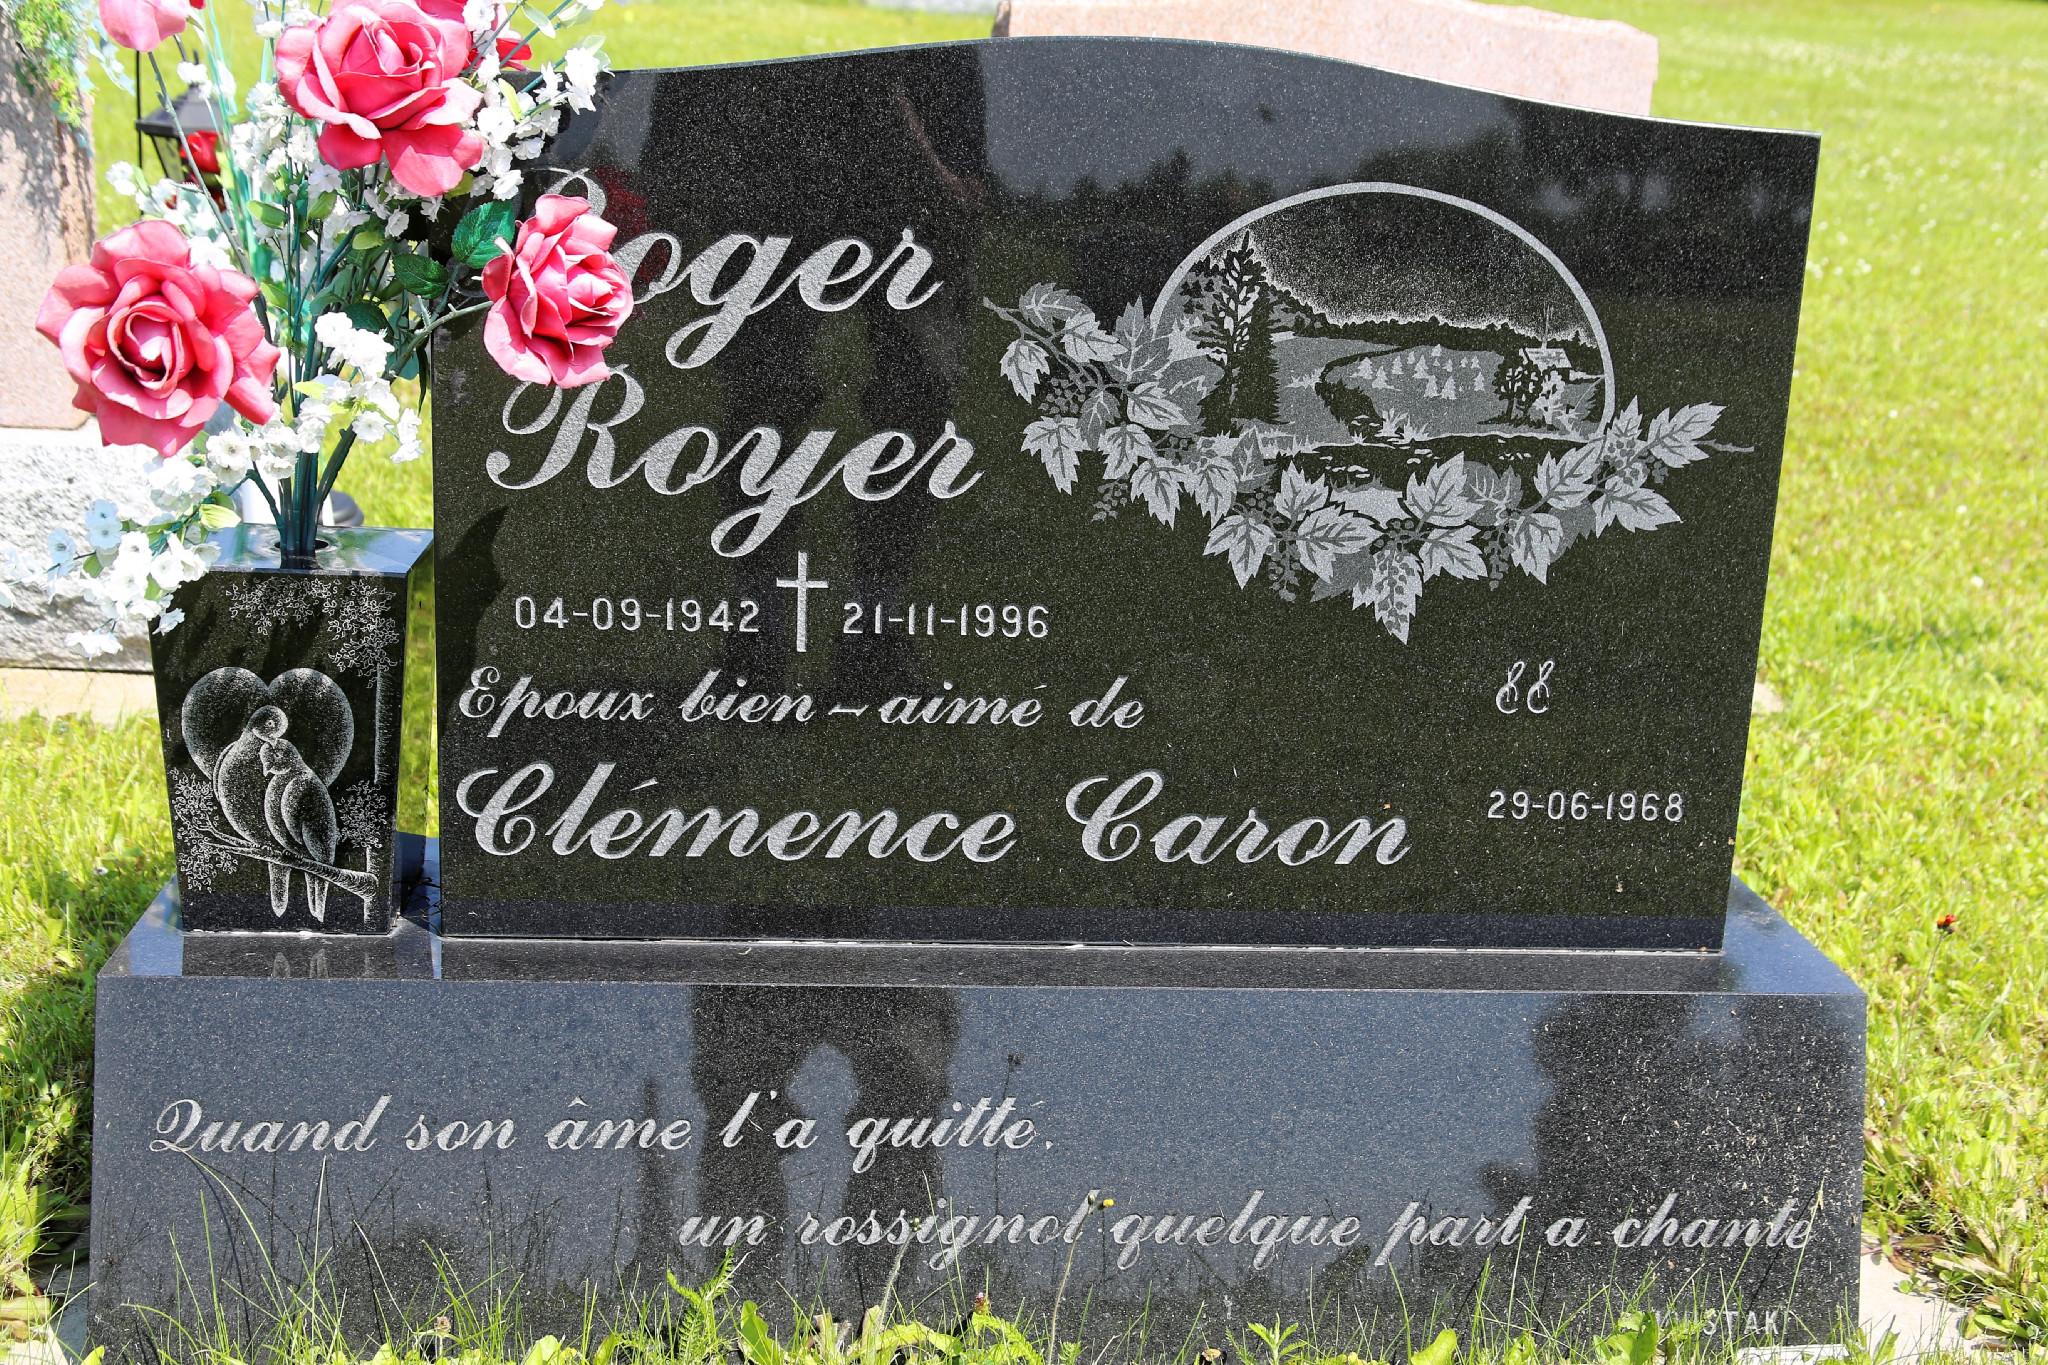 Roger Royer